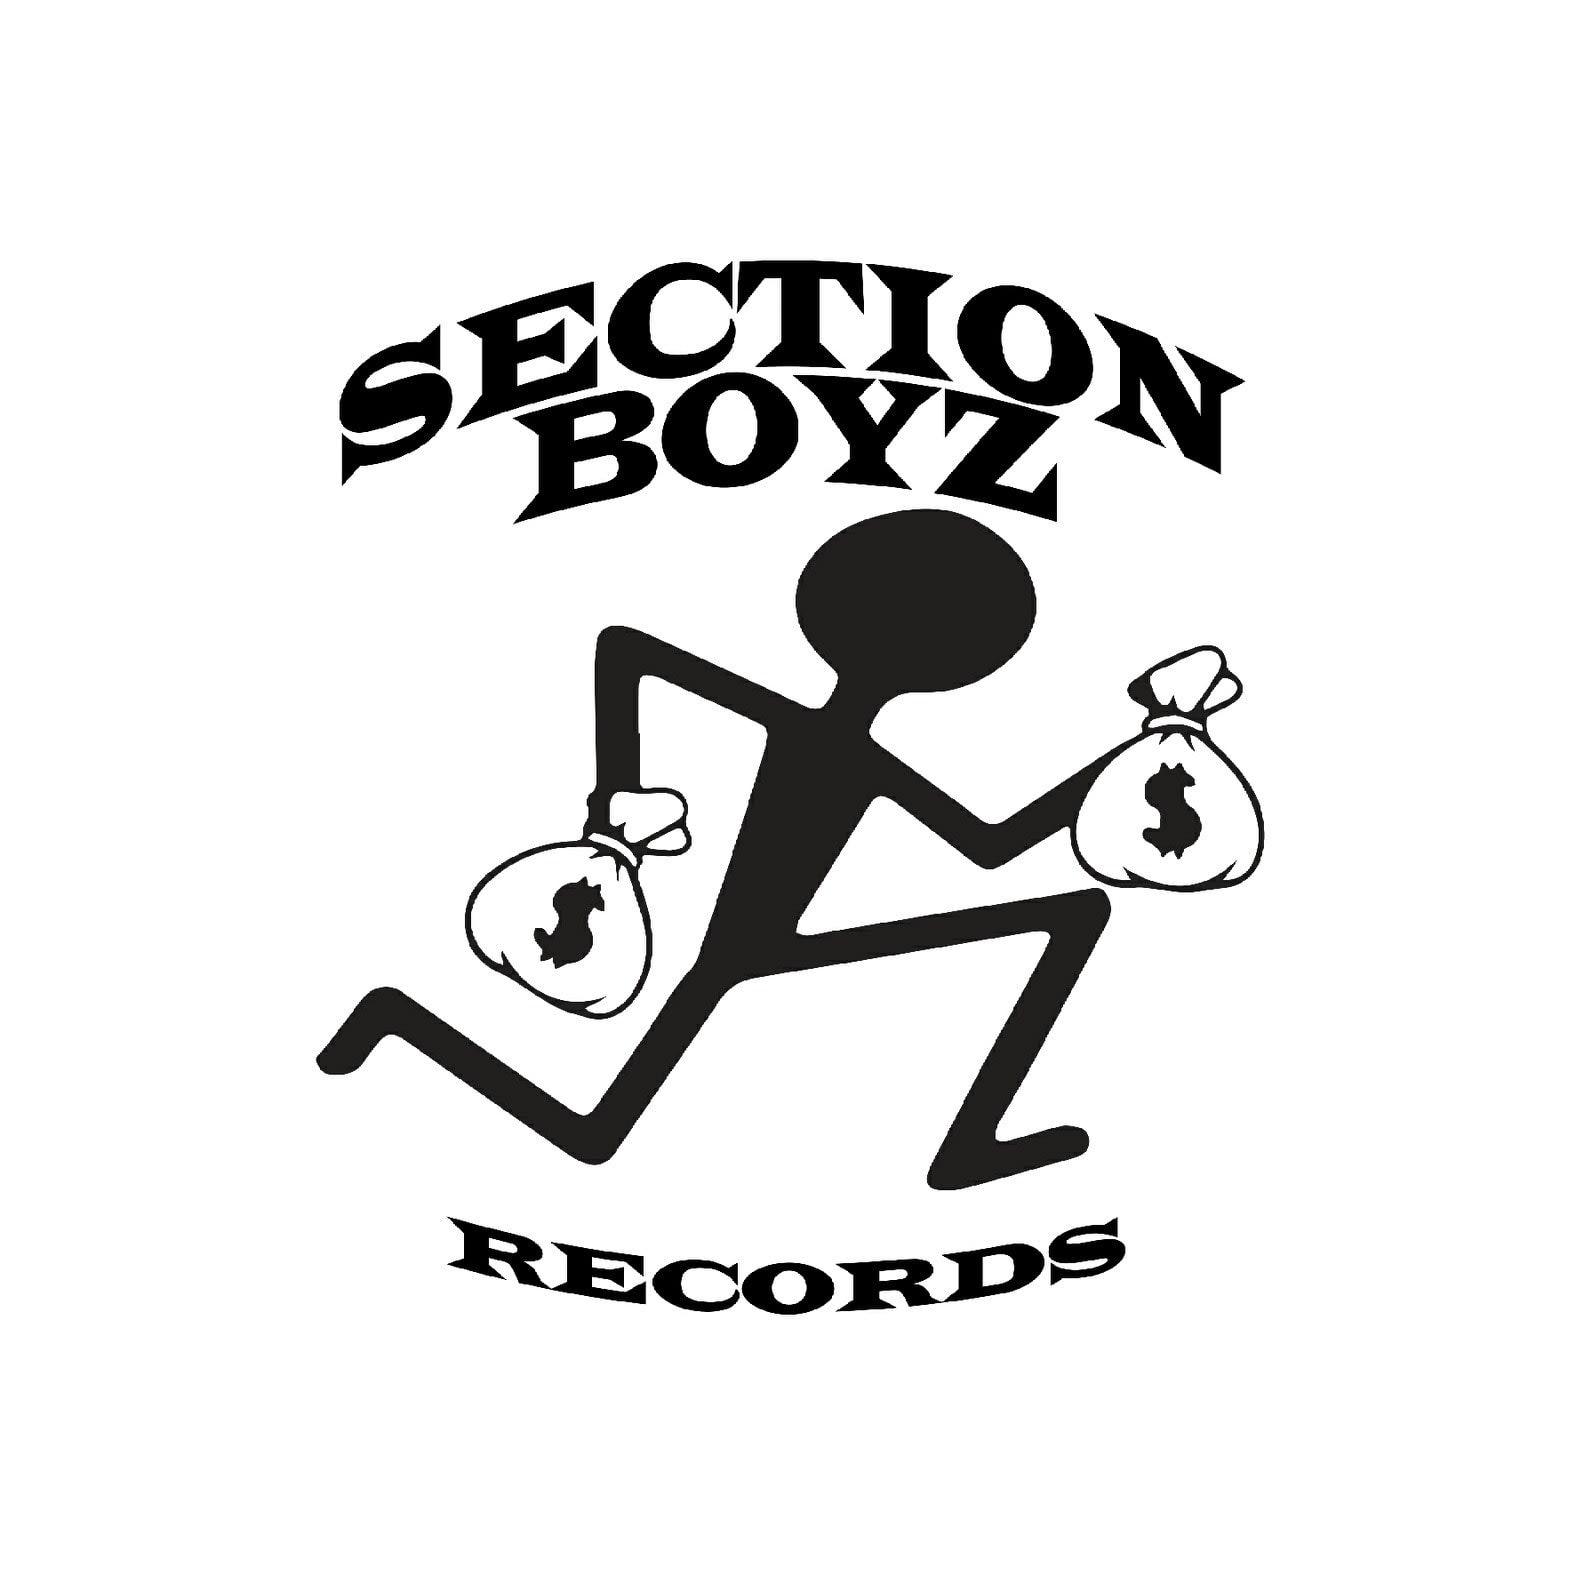 Section Boyz Records LLC